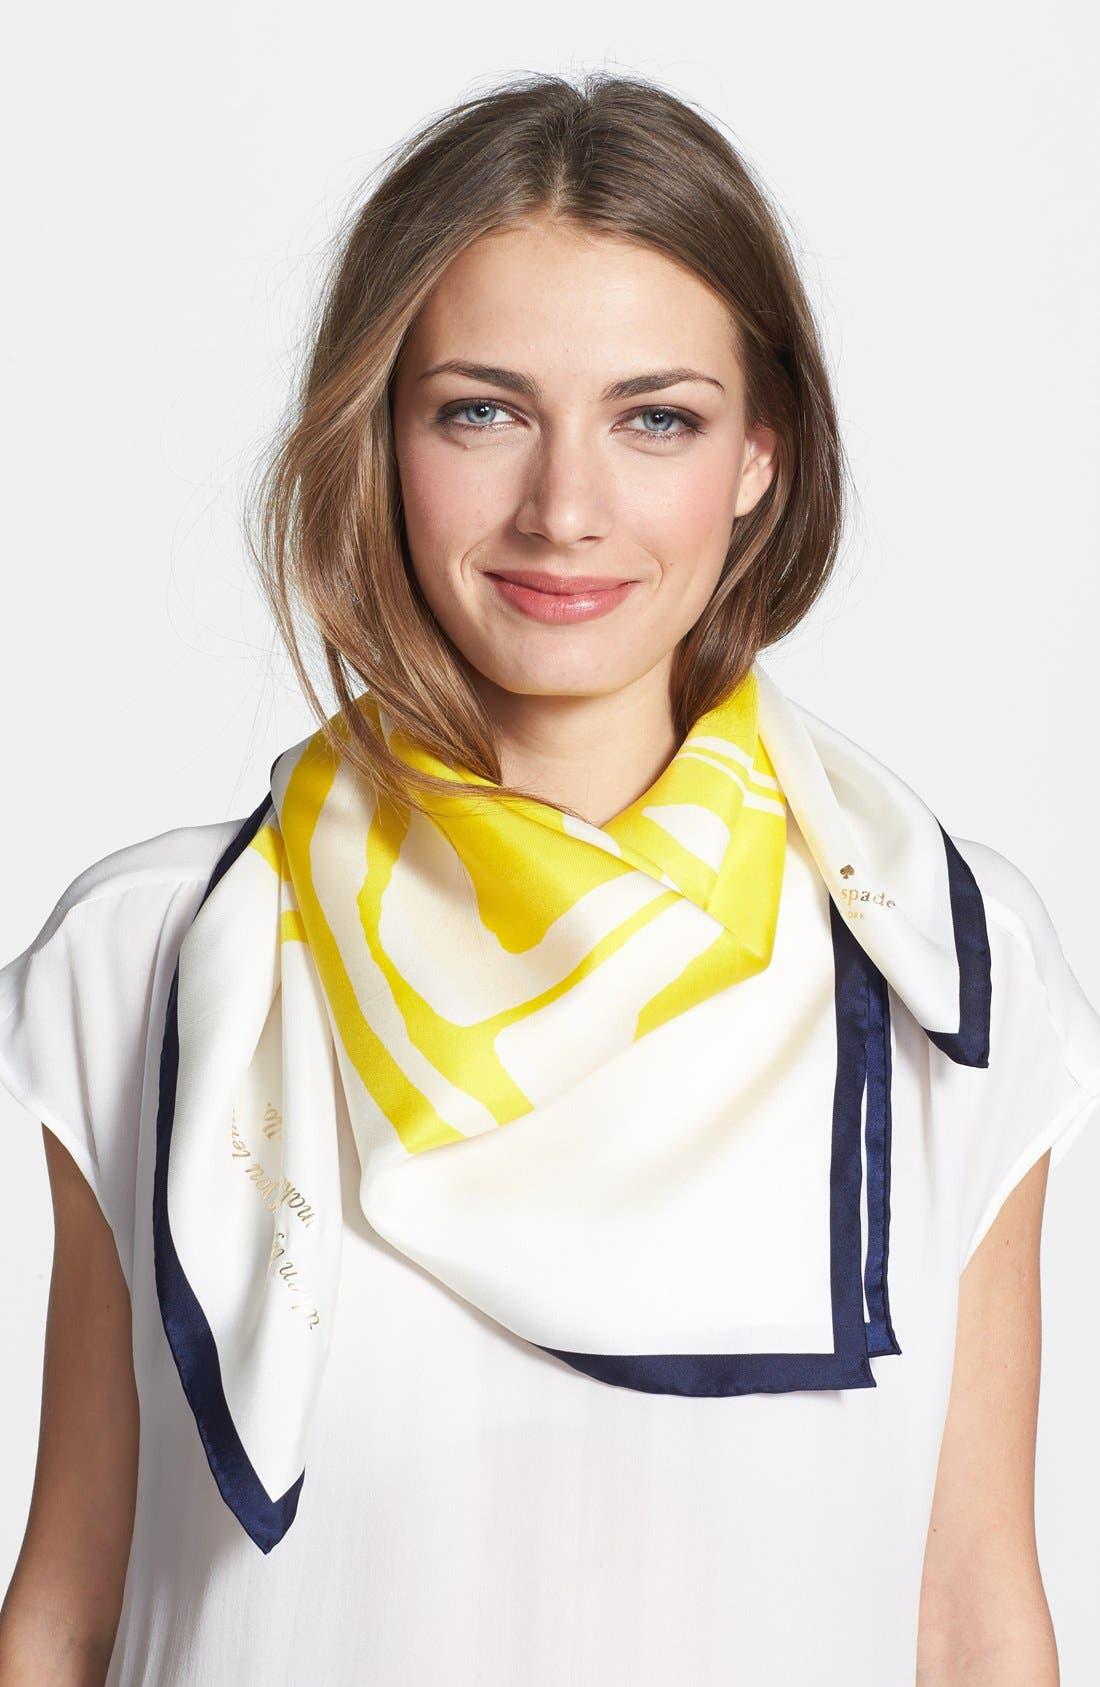 Alternate Image 1 Selected - kate spade new york 'lemon slice' silk scarf